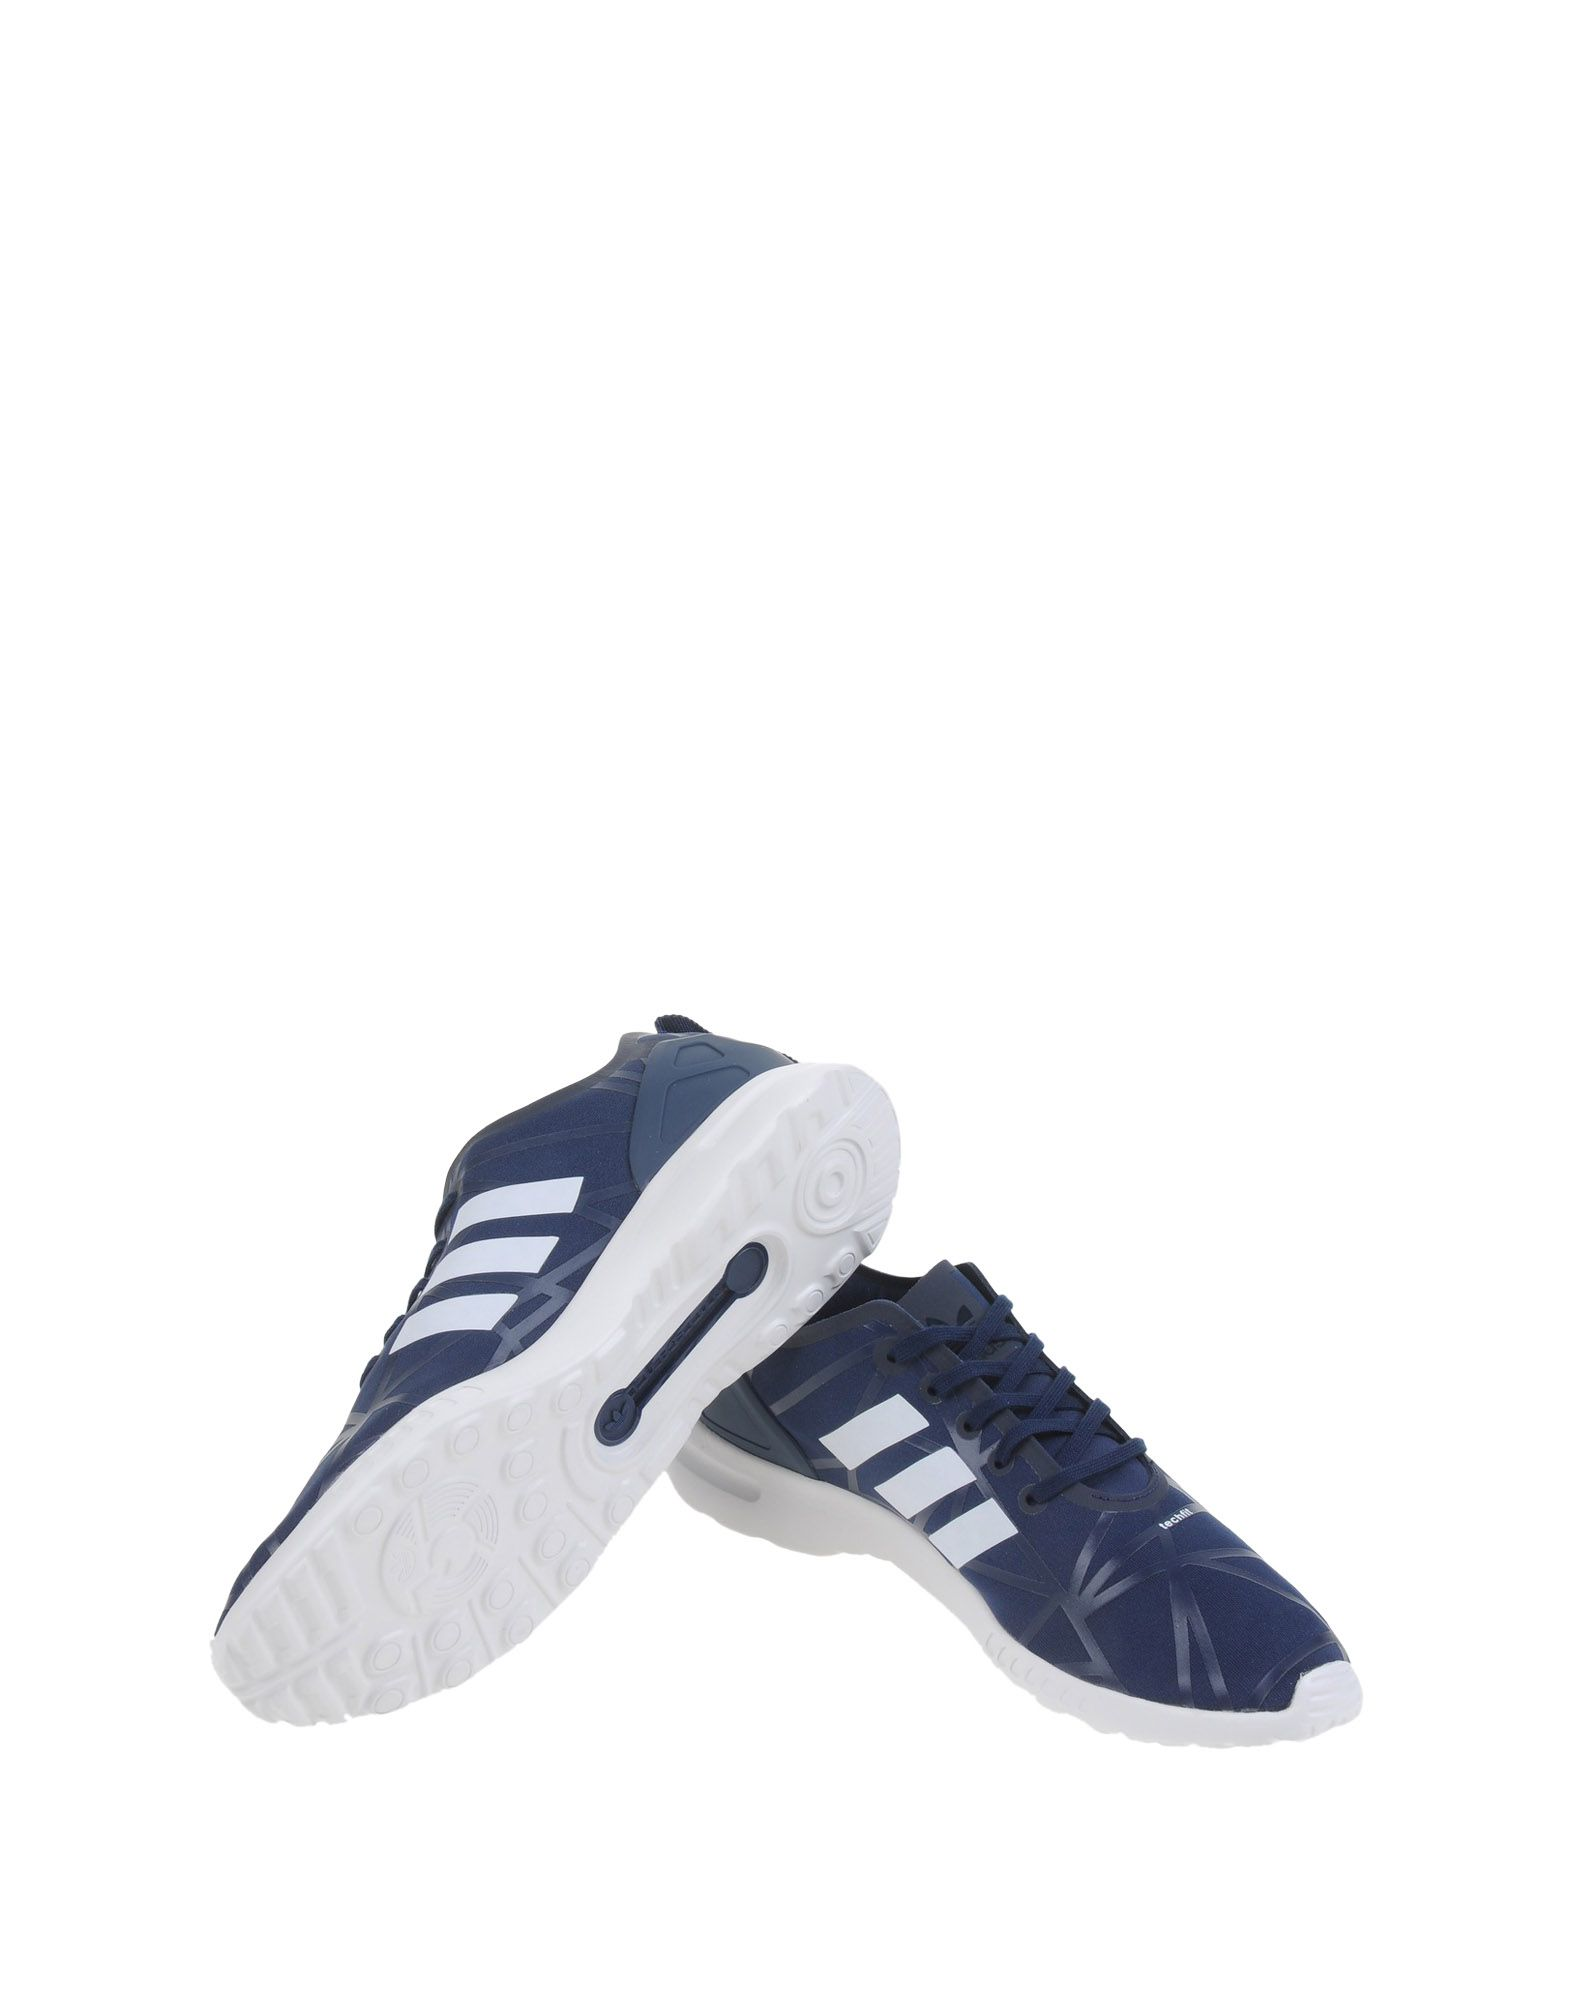 Adidas Originals Sneakers Damen  11083294IS Gute Qualität beliebte Schuhe Schuhe Schuhe 2ab3ef